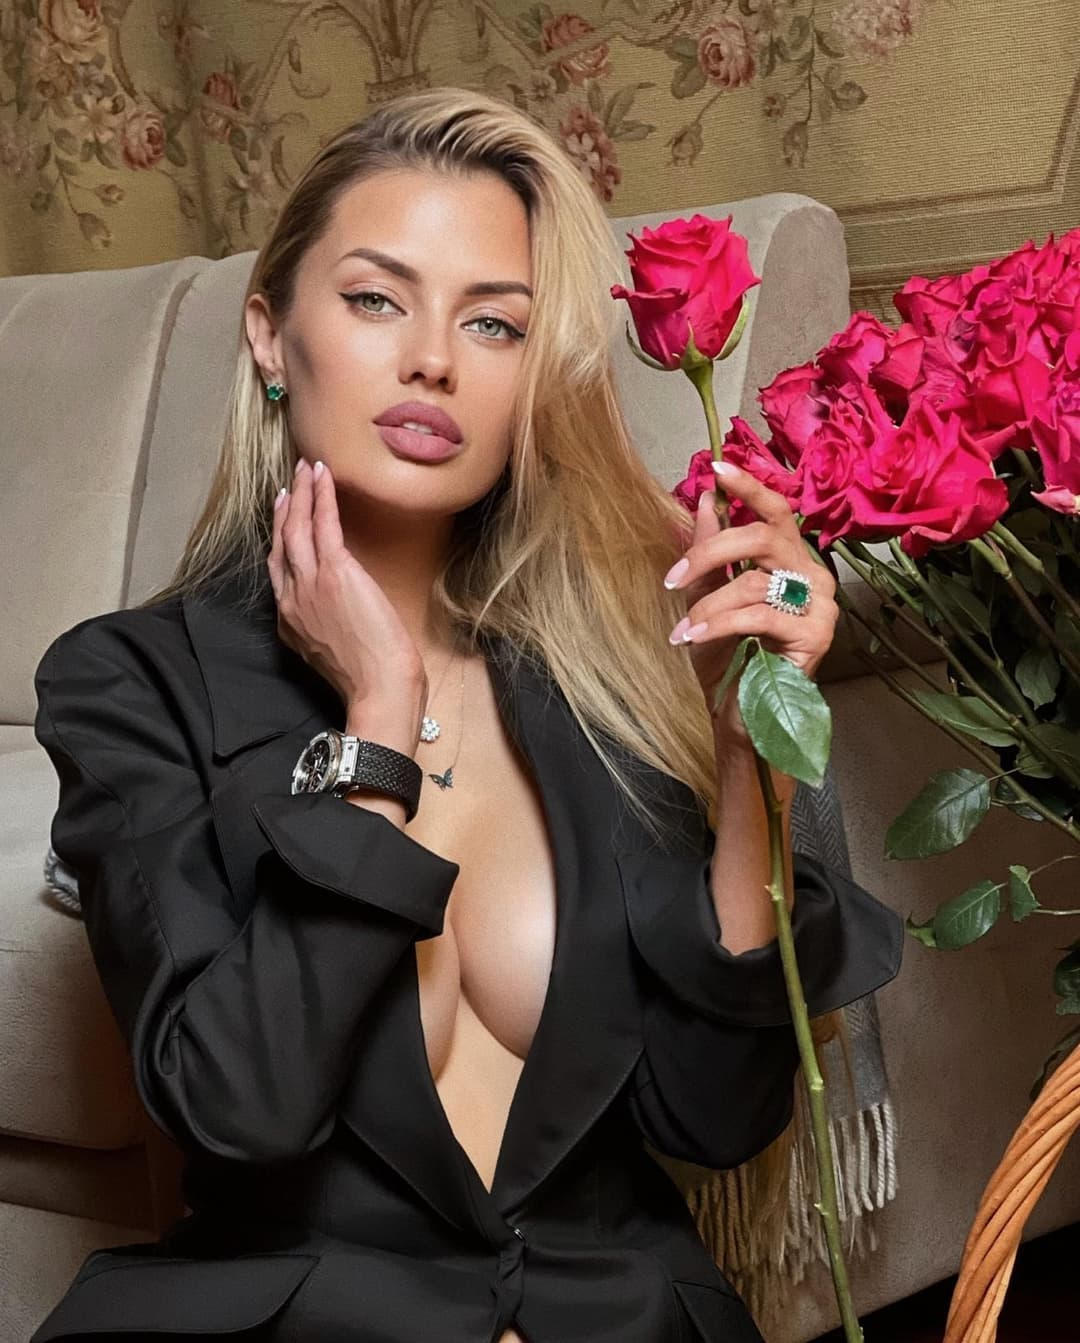 Victoria Bonya arranged an erotic home photo shoot